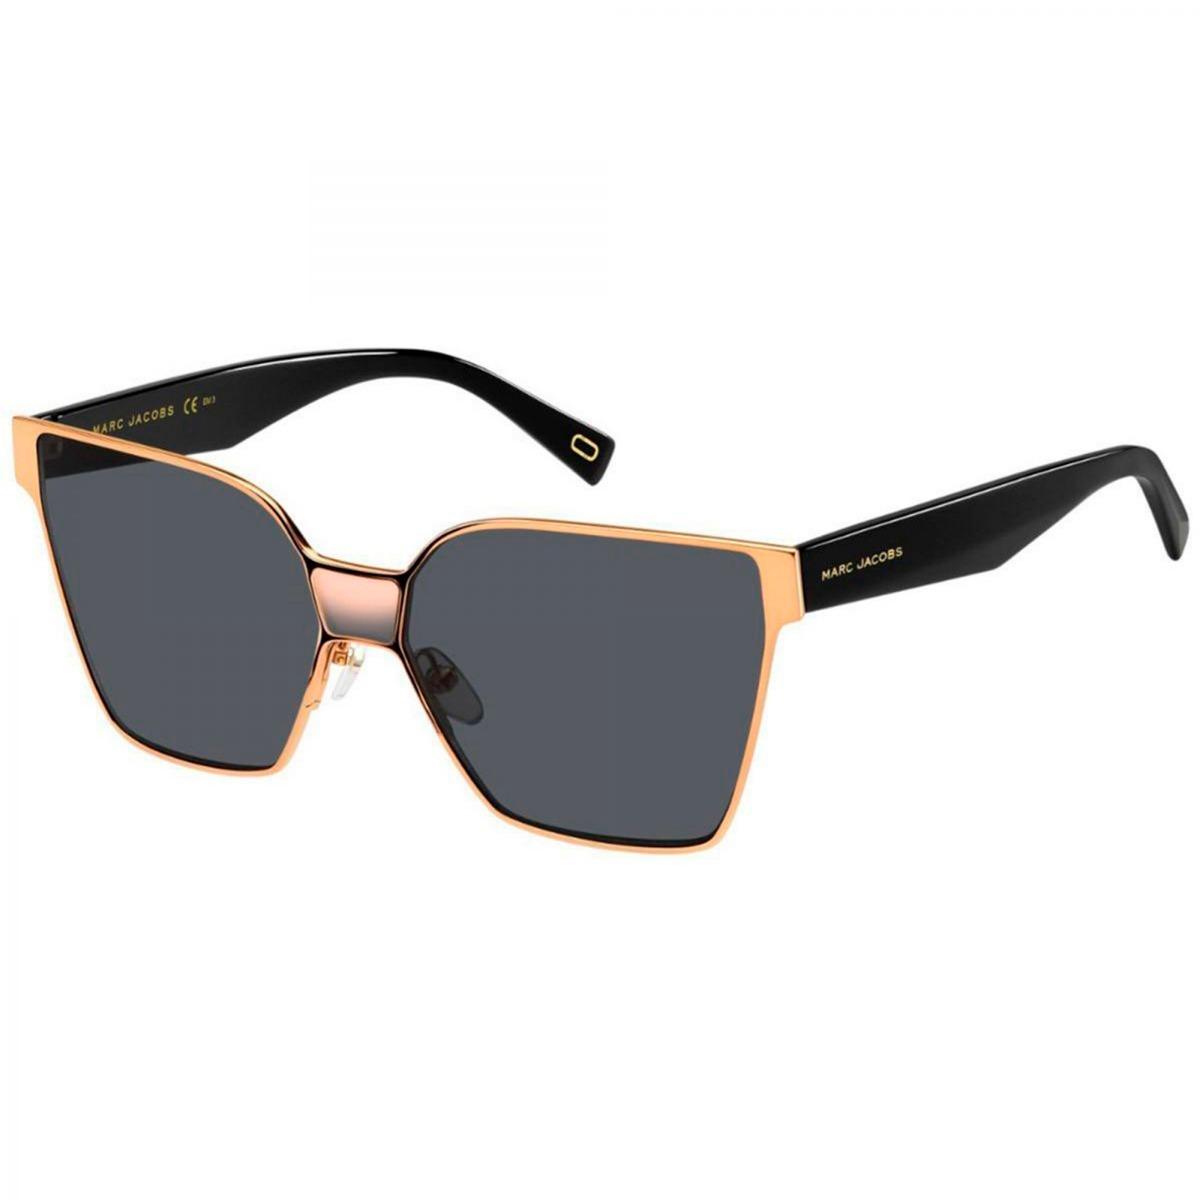 7f08b09c5ad95 Óculos De Sol Marc Jacobs 212 s 24sir 60x14 145 - R  805,60 em ...